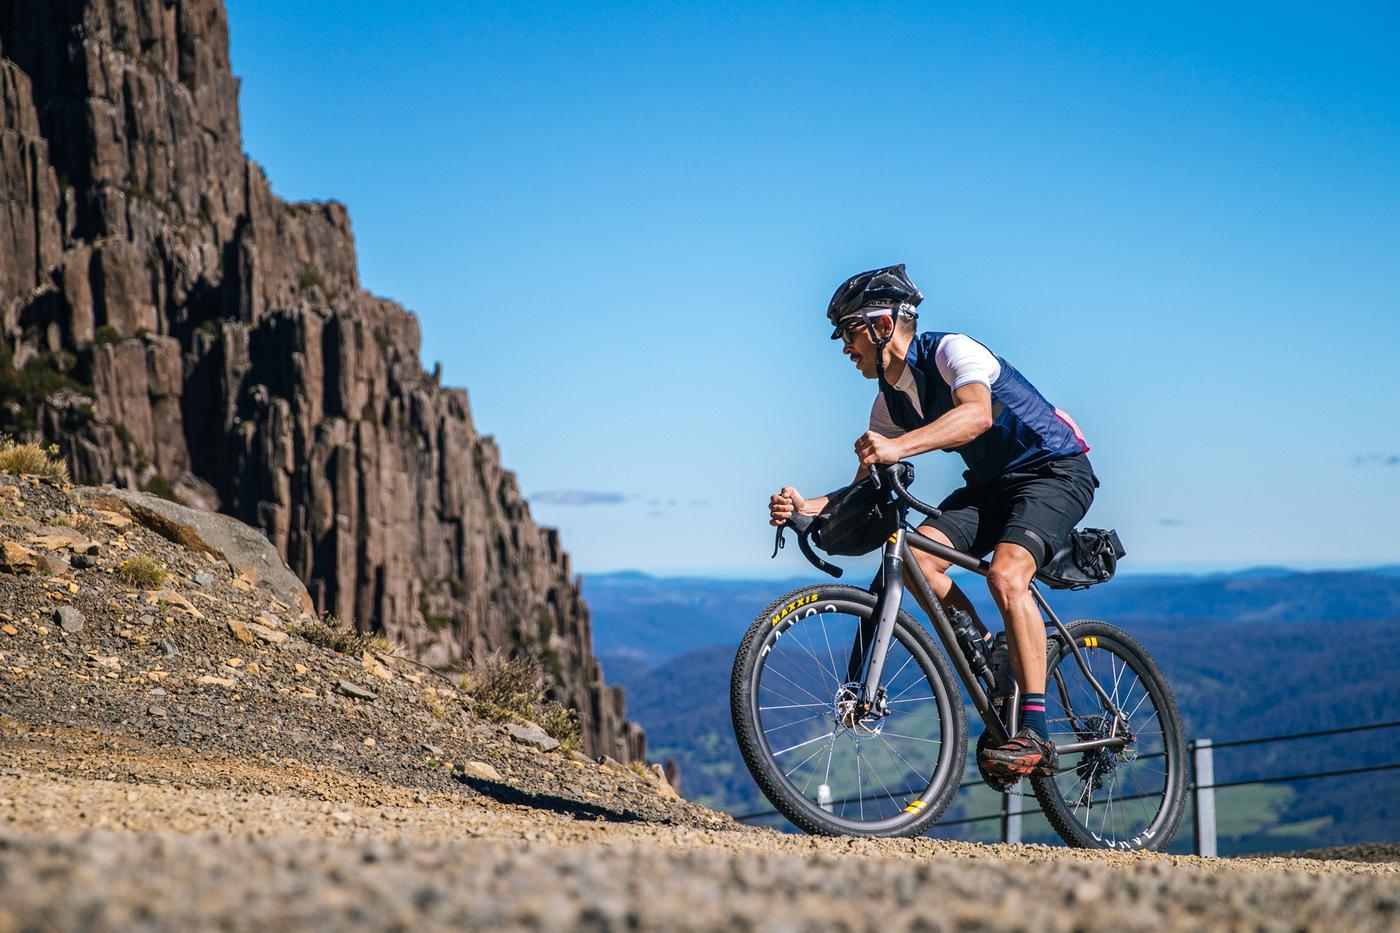 Scott riding Jesse's Curve Cycling GMX Drop Bar Rigid 29'r